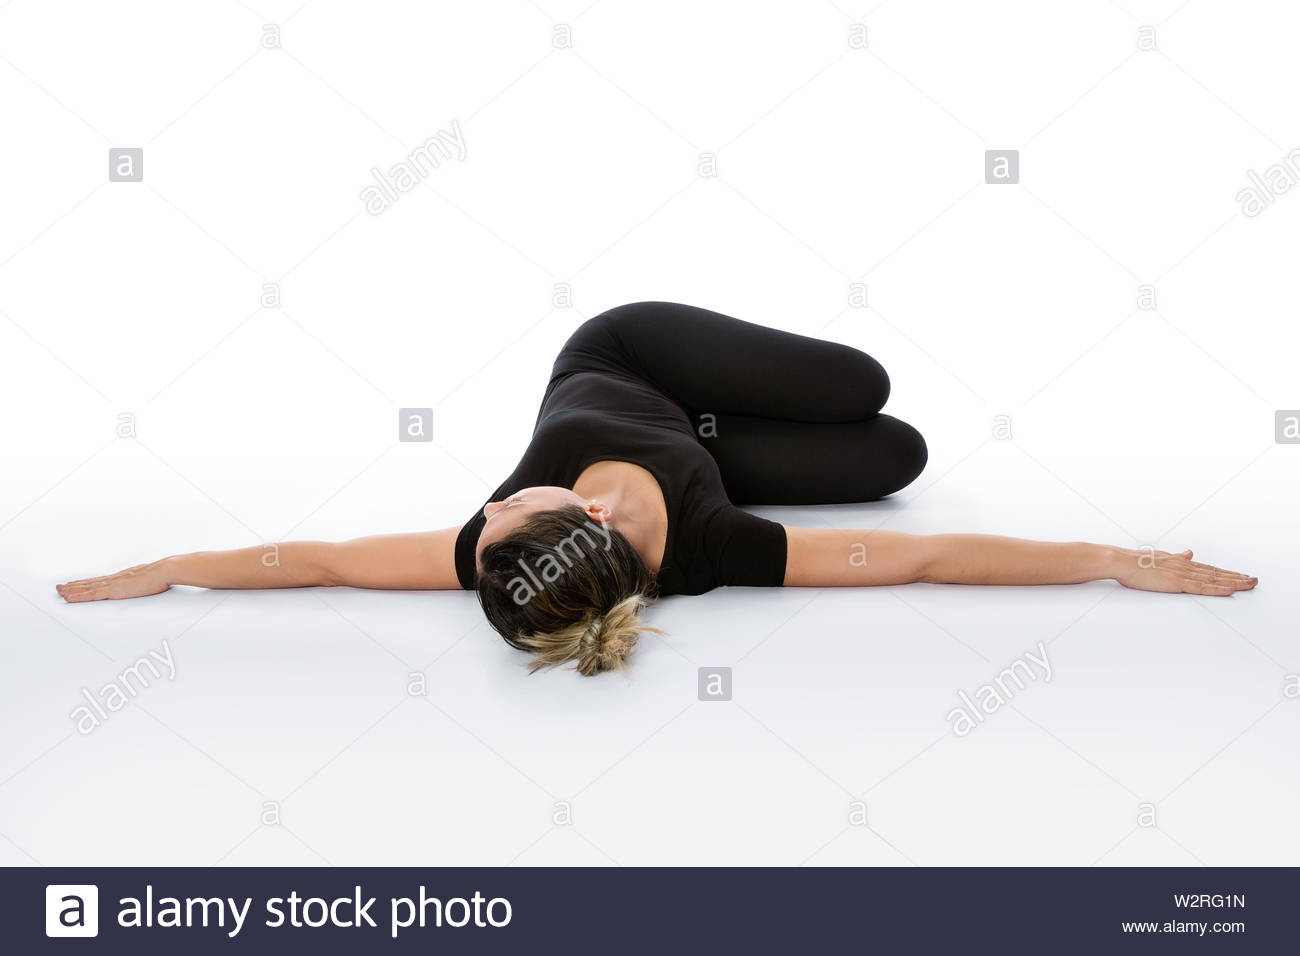 Supta Matsyendrasana yoga pose (Reclined Spinal Twist pose). Yoga poses woman isolated with white background. Yoga pose set. Mindfulness and Spiritual Stock Photo